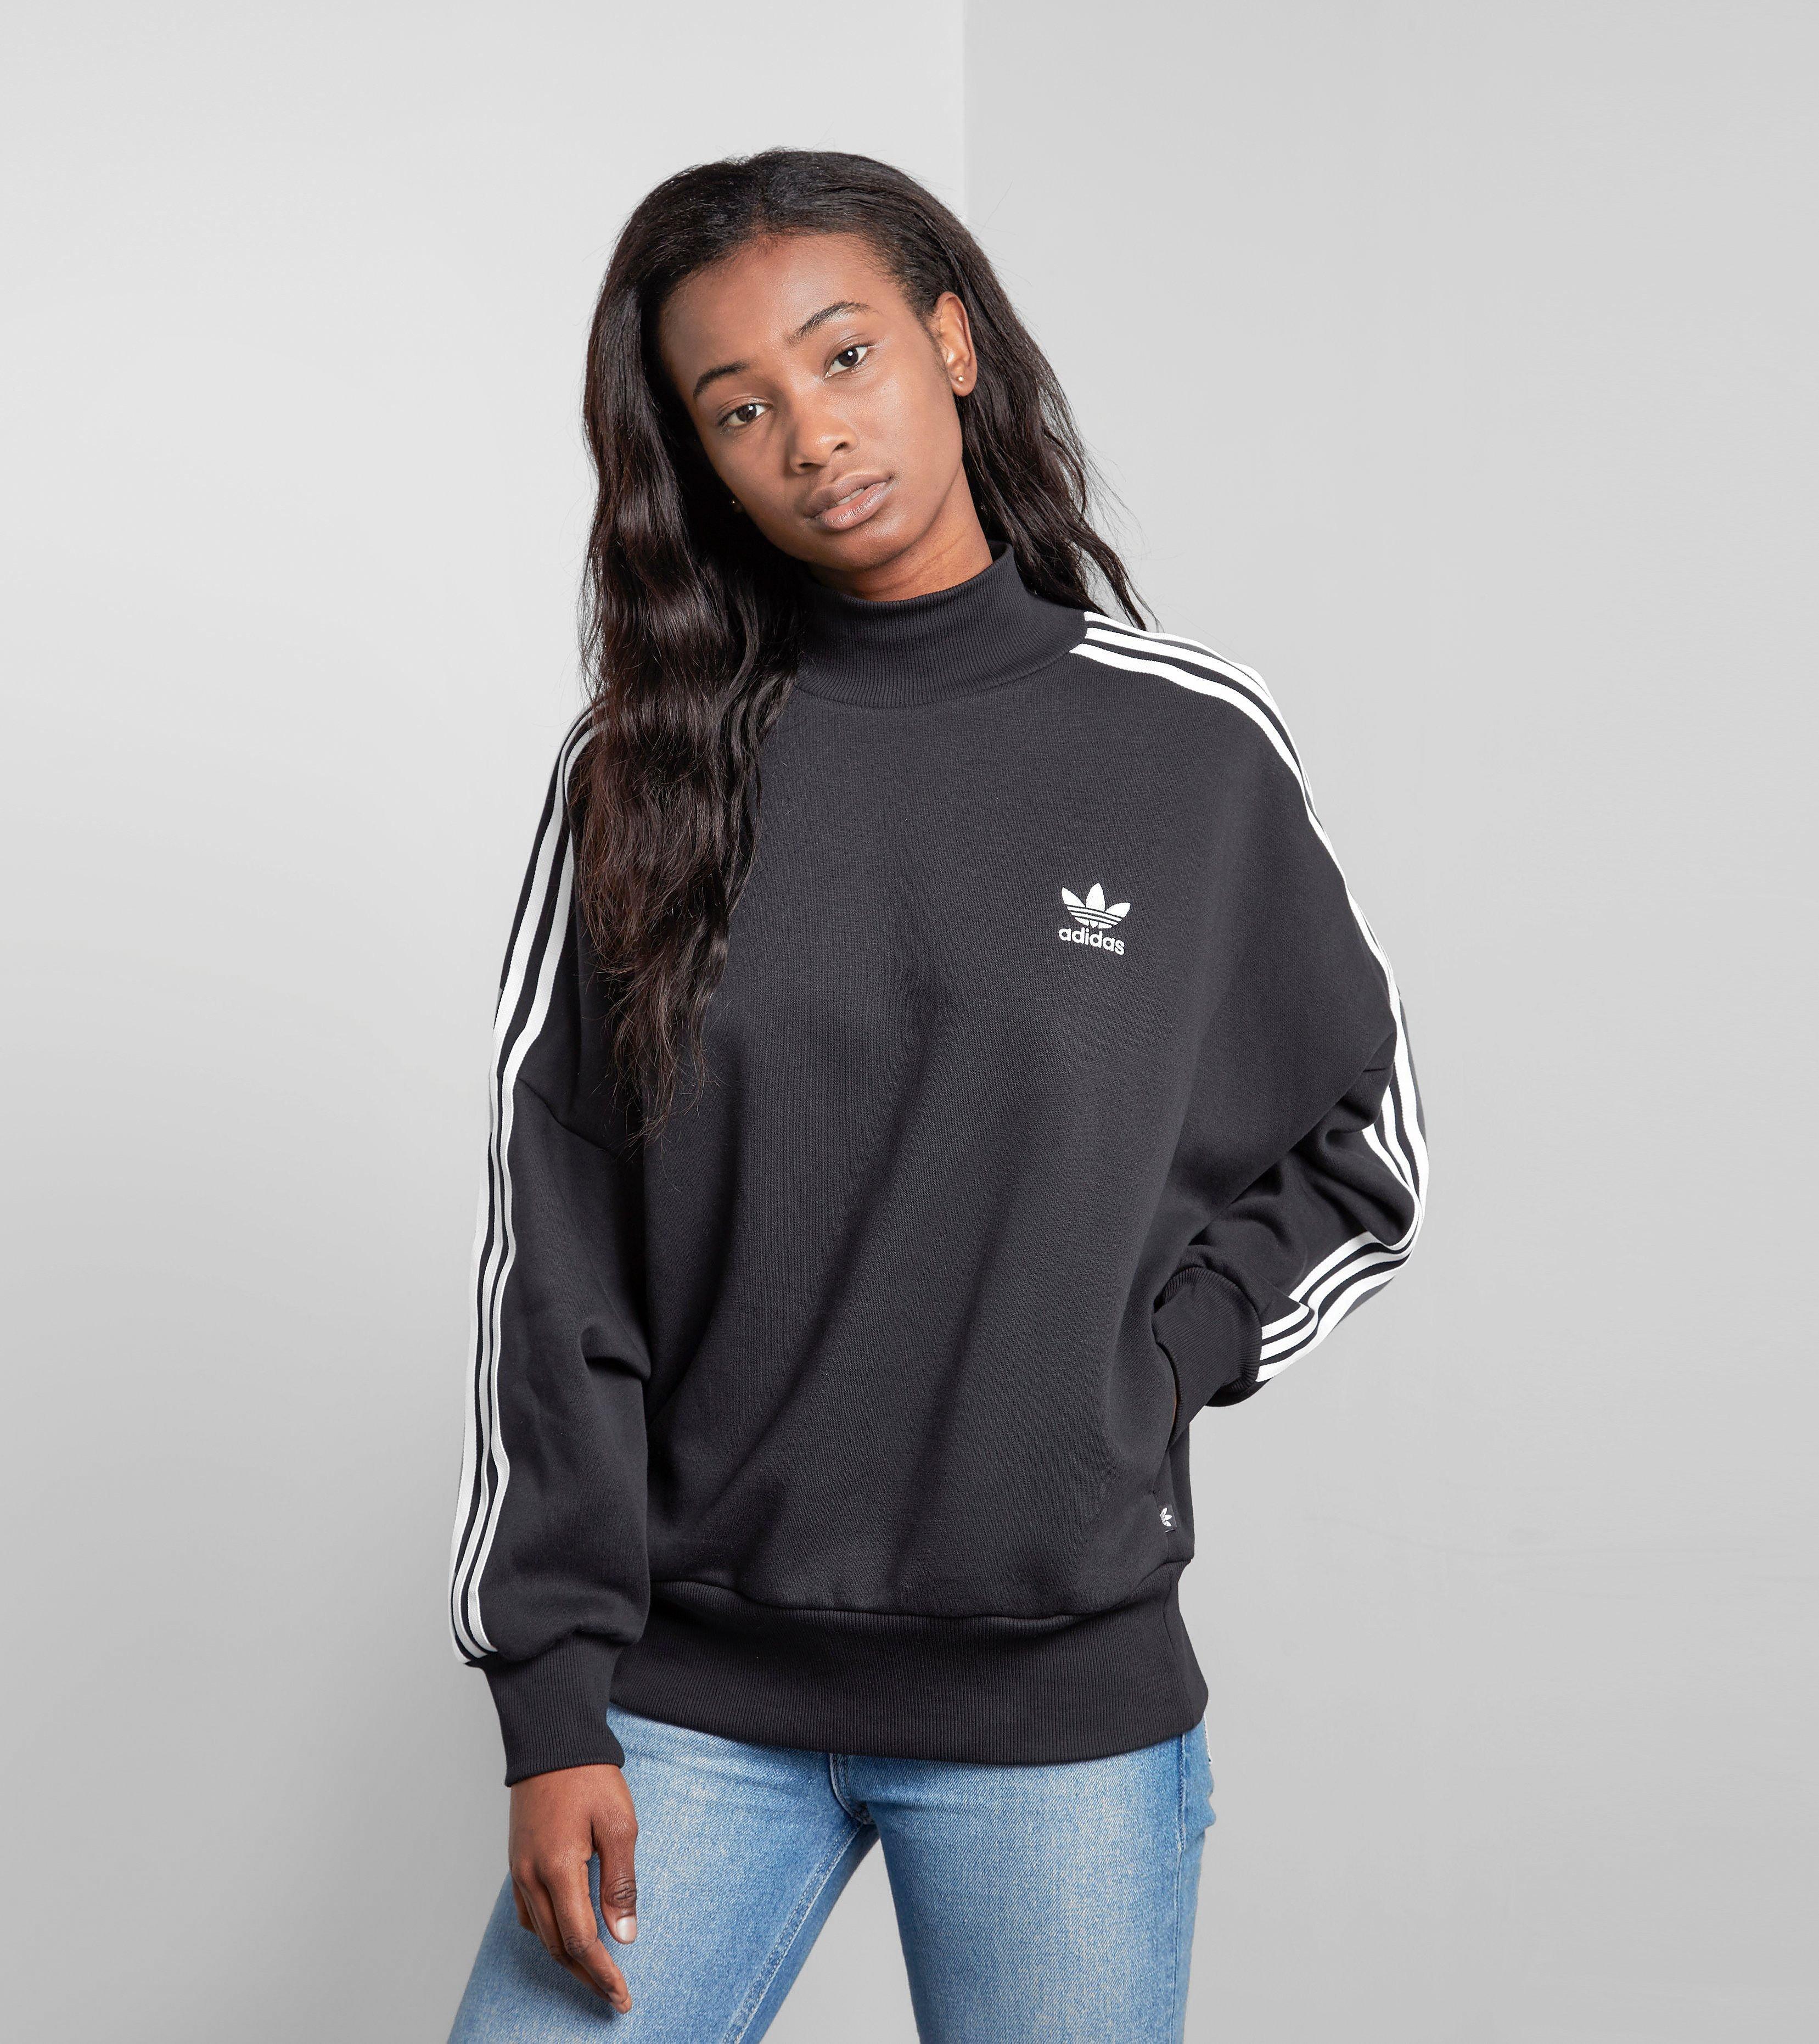 adidas Originals 3 Stripes Turtleneck Sweatshirt